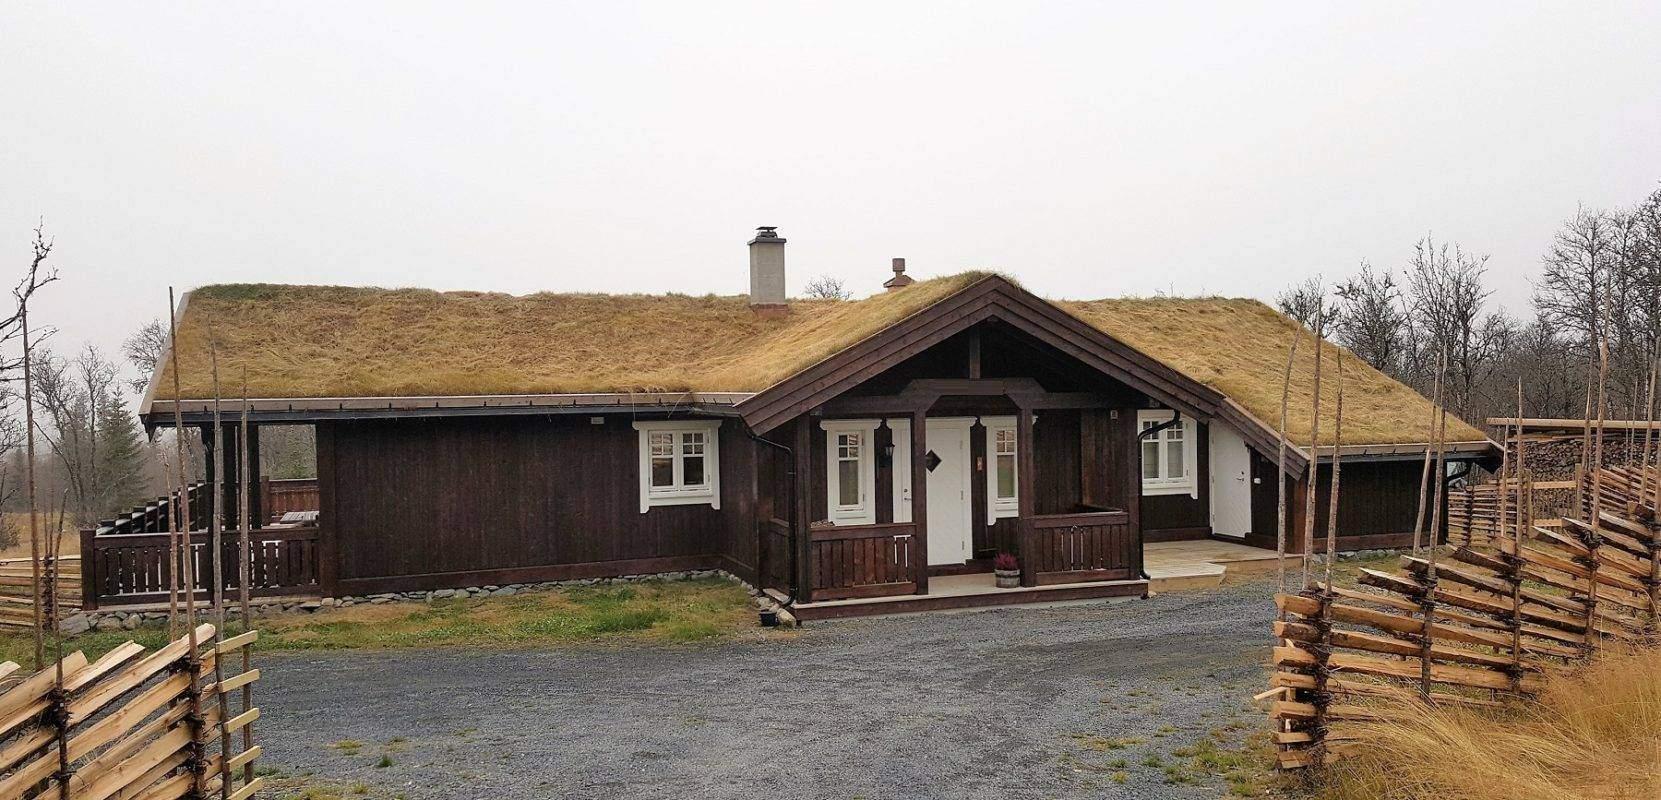 31 Vaset Snøtind113 167 31